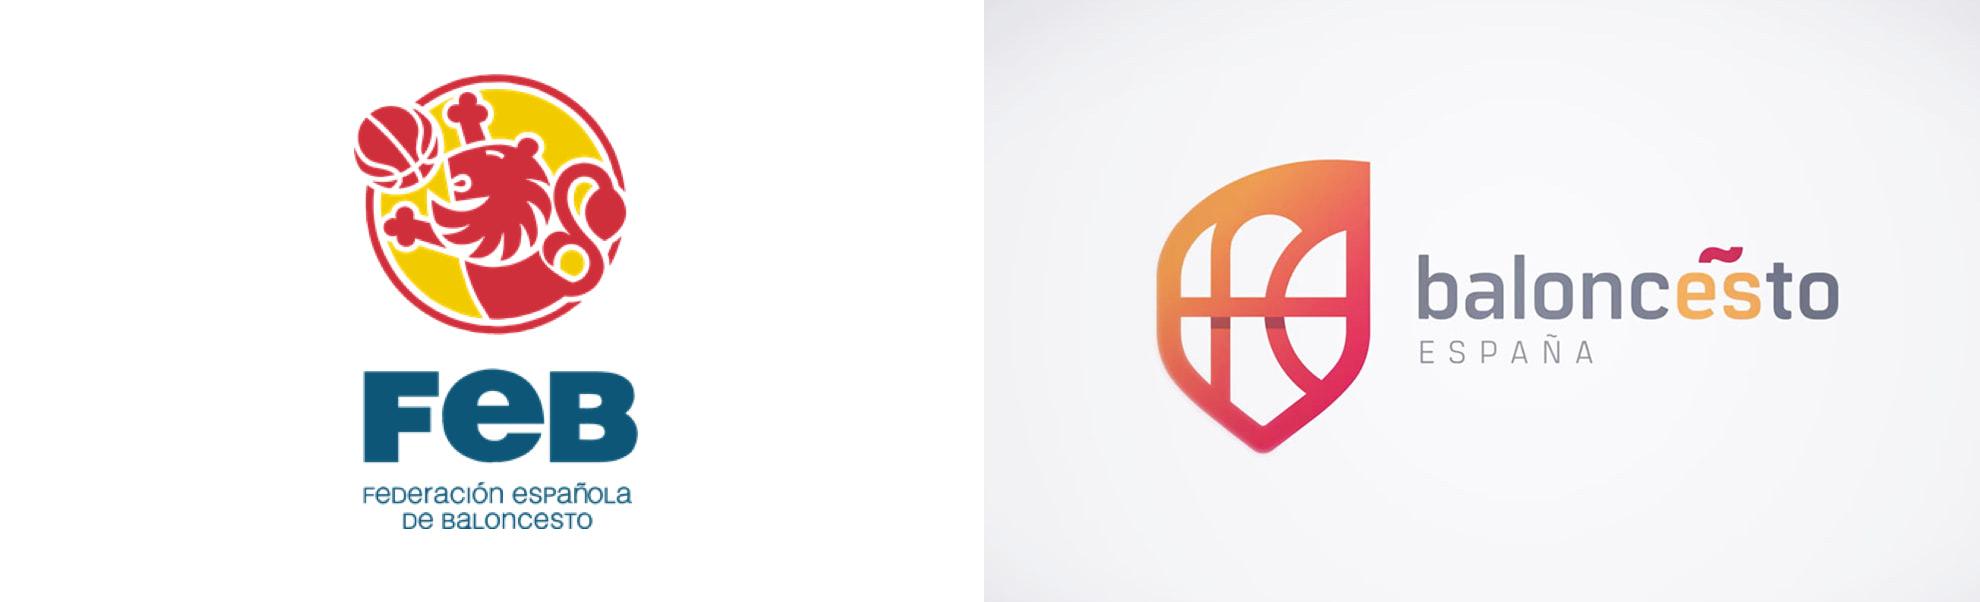 nowe logo Federación Española de Baloncesto (FEB)